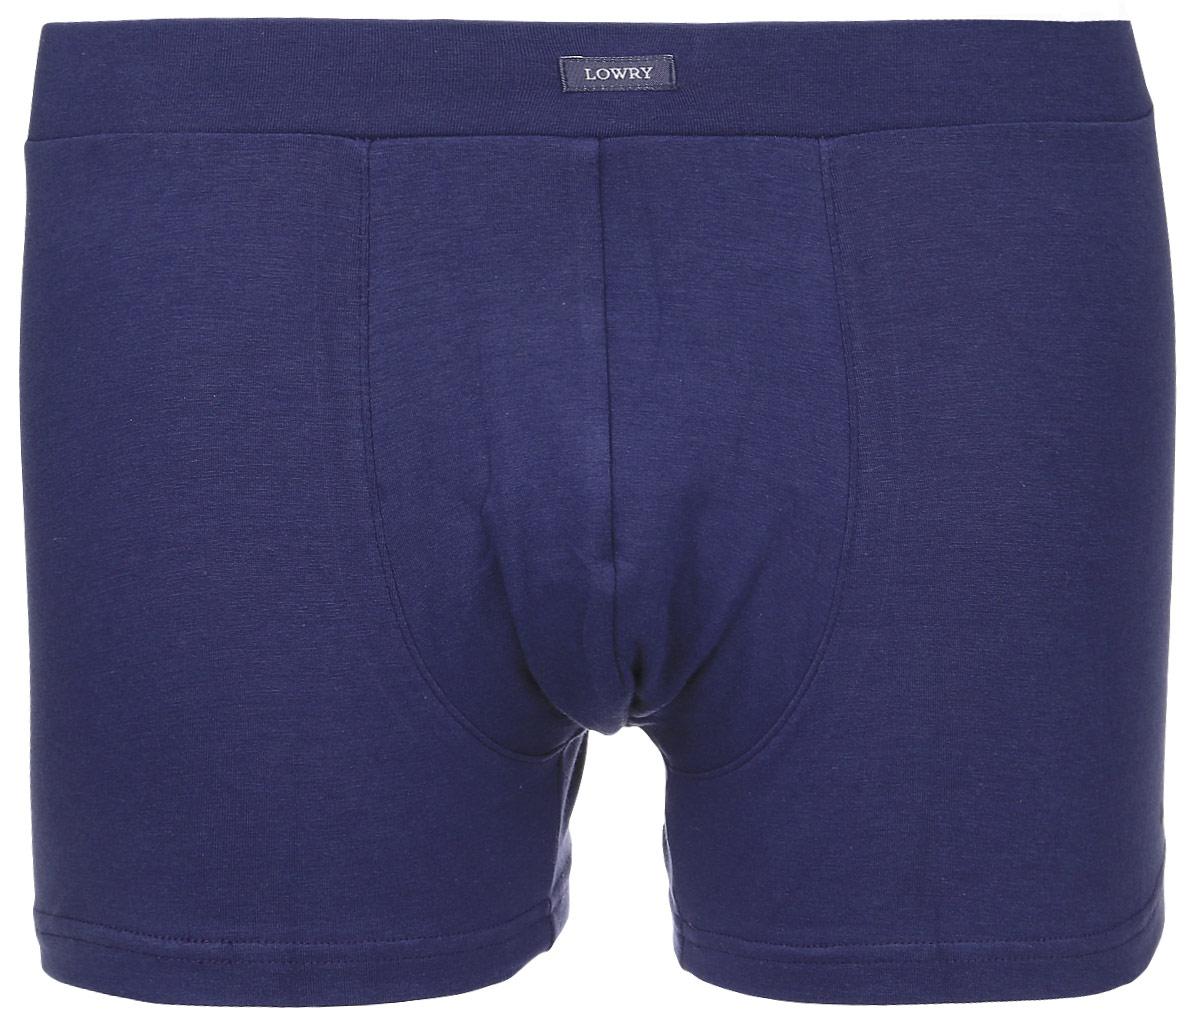 Трусы-боксеры мужские Lowry, цвет: темно-синий. MSHL-440. Размер XXL (52) трусы lowry трусы 3 шт